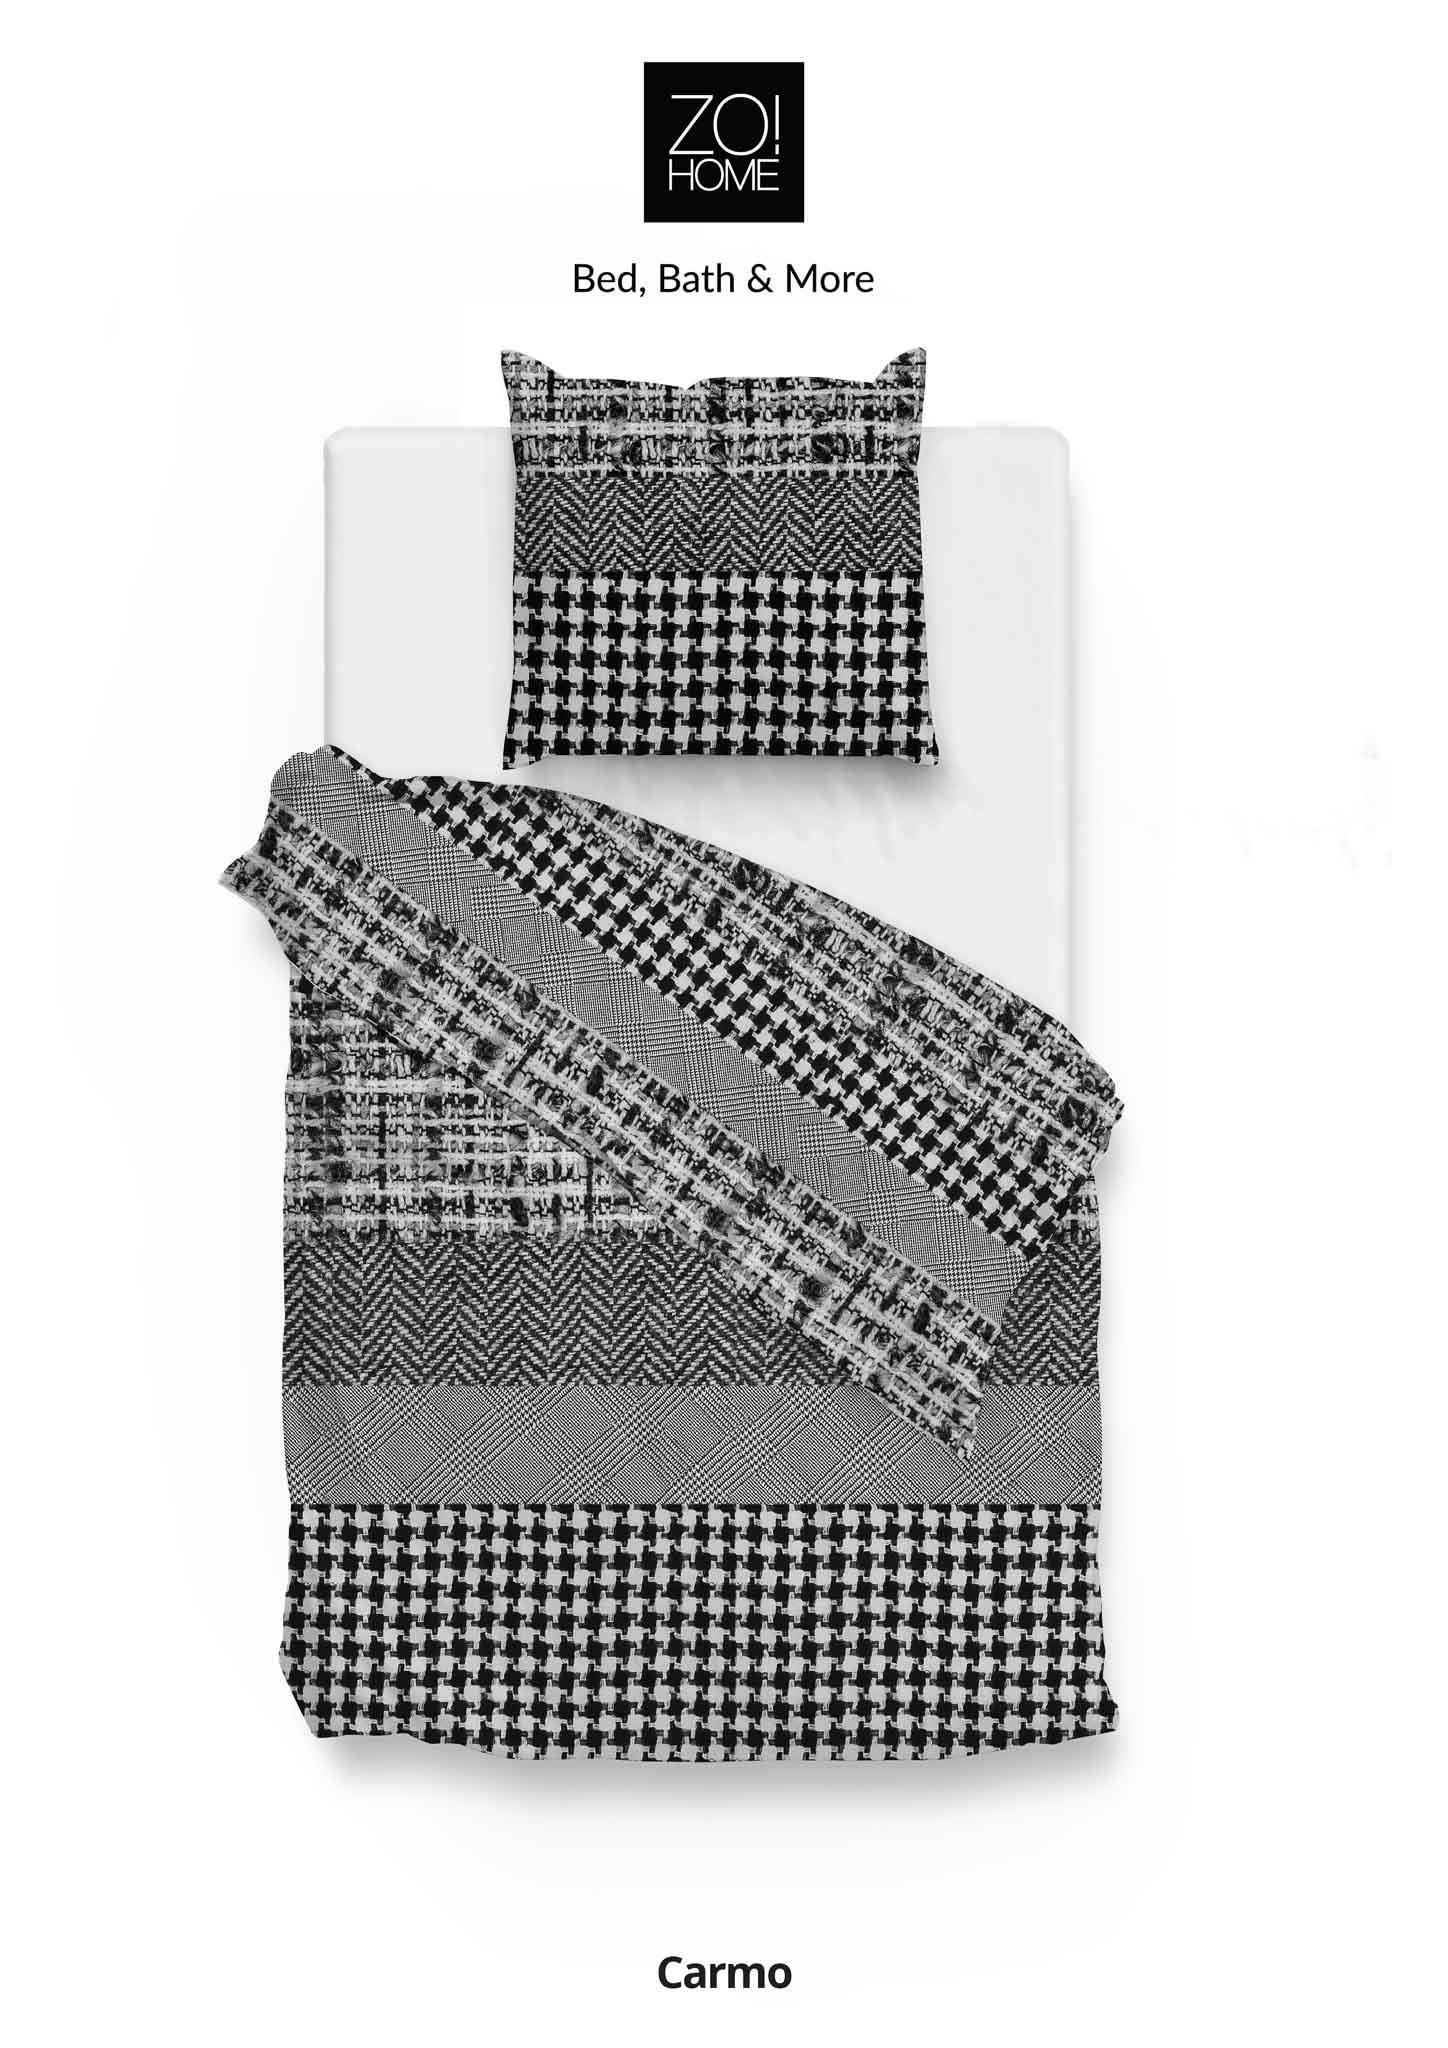 Bettwäsche Carmo 155x220cm Black/White